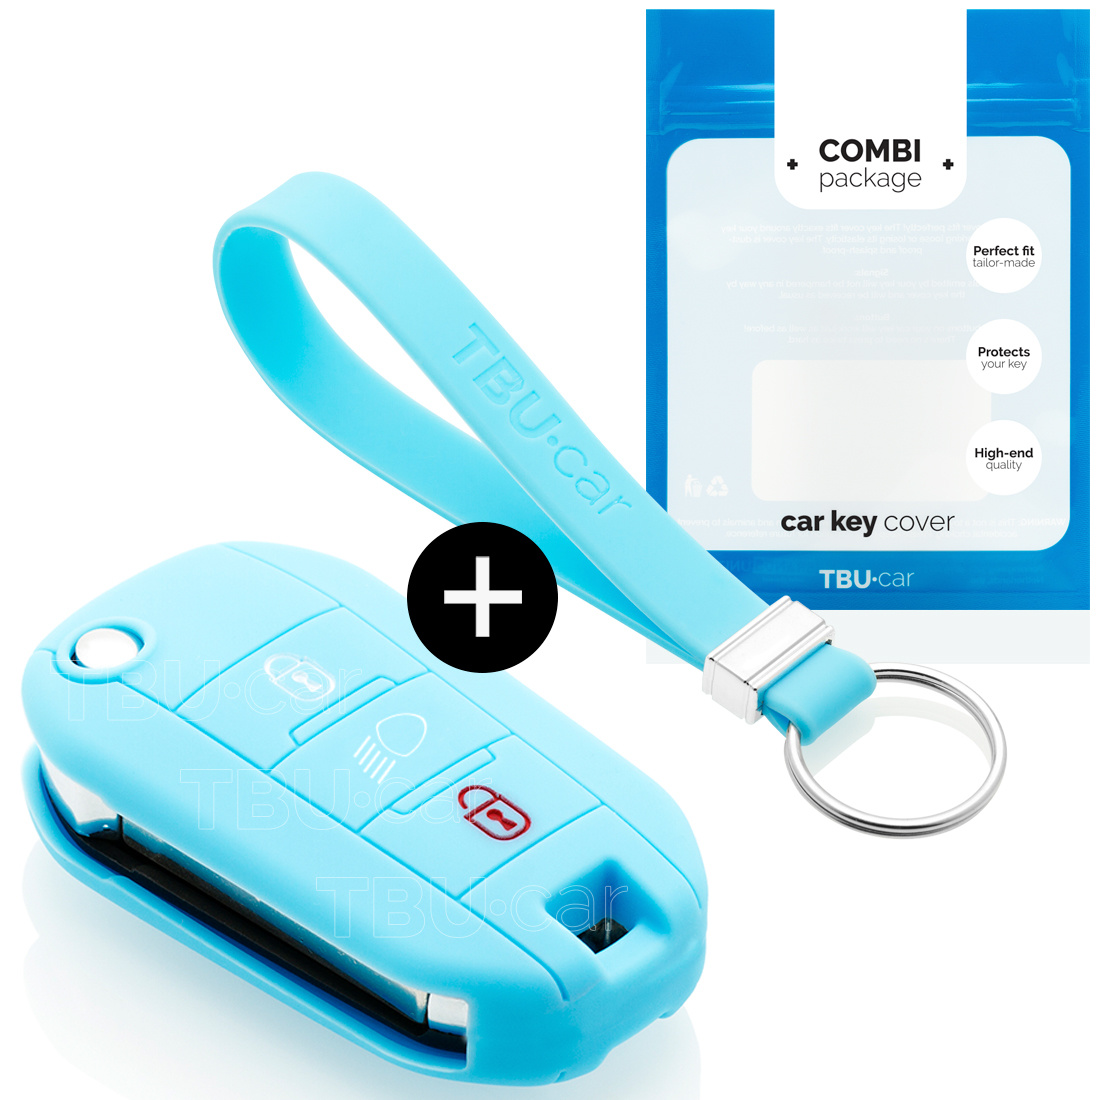 Peugeot Autoschlüssel Hülle - Silikon Schutzhülle - Schlüsselhülle Cover - Hellblau